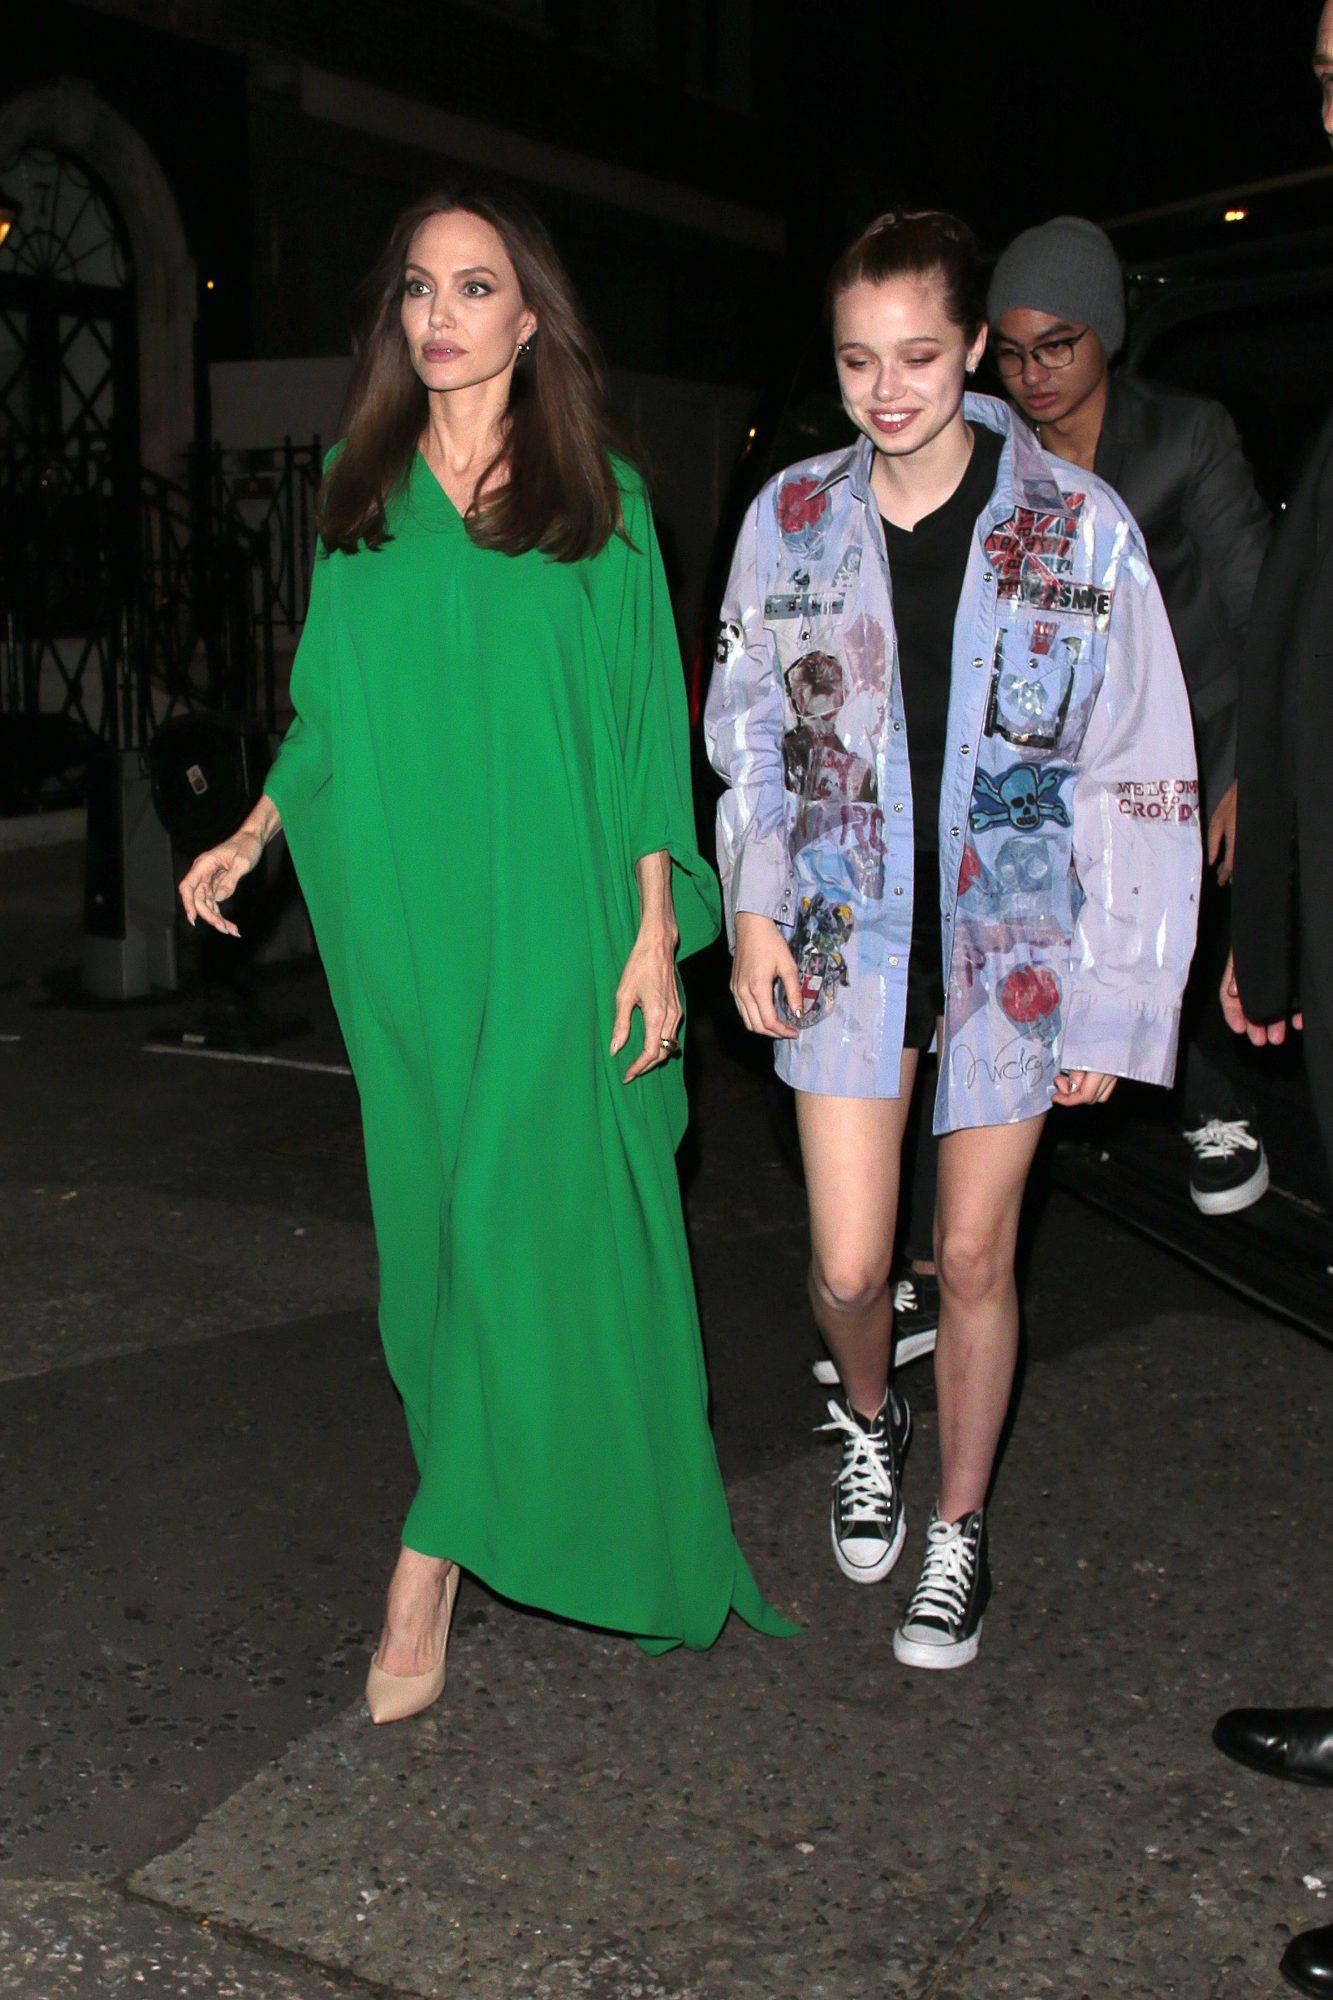 Angelina Jolie, Shiloh Jolie Pitt